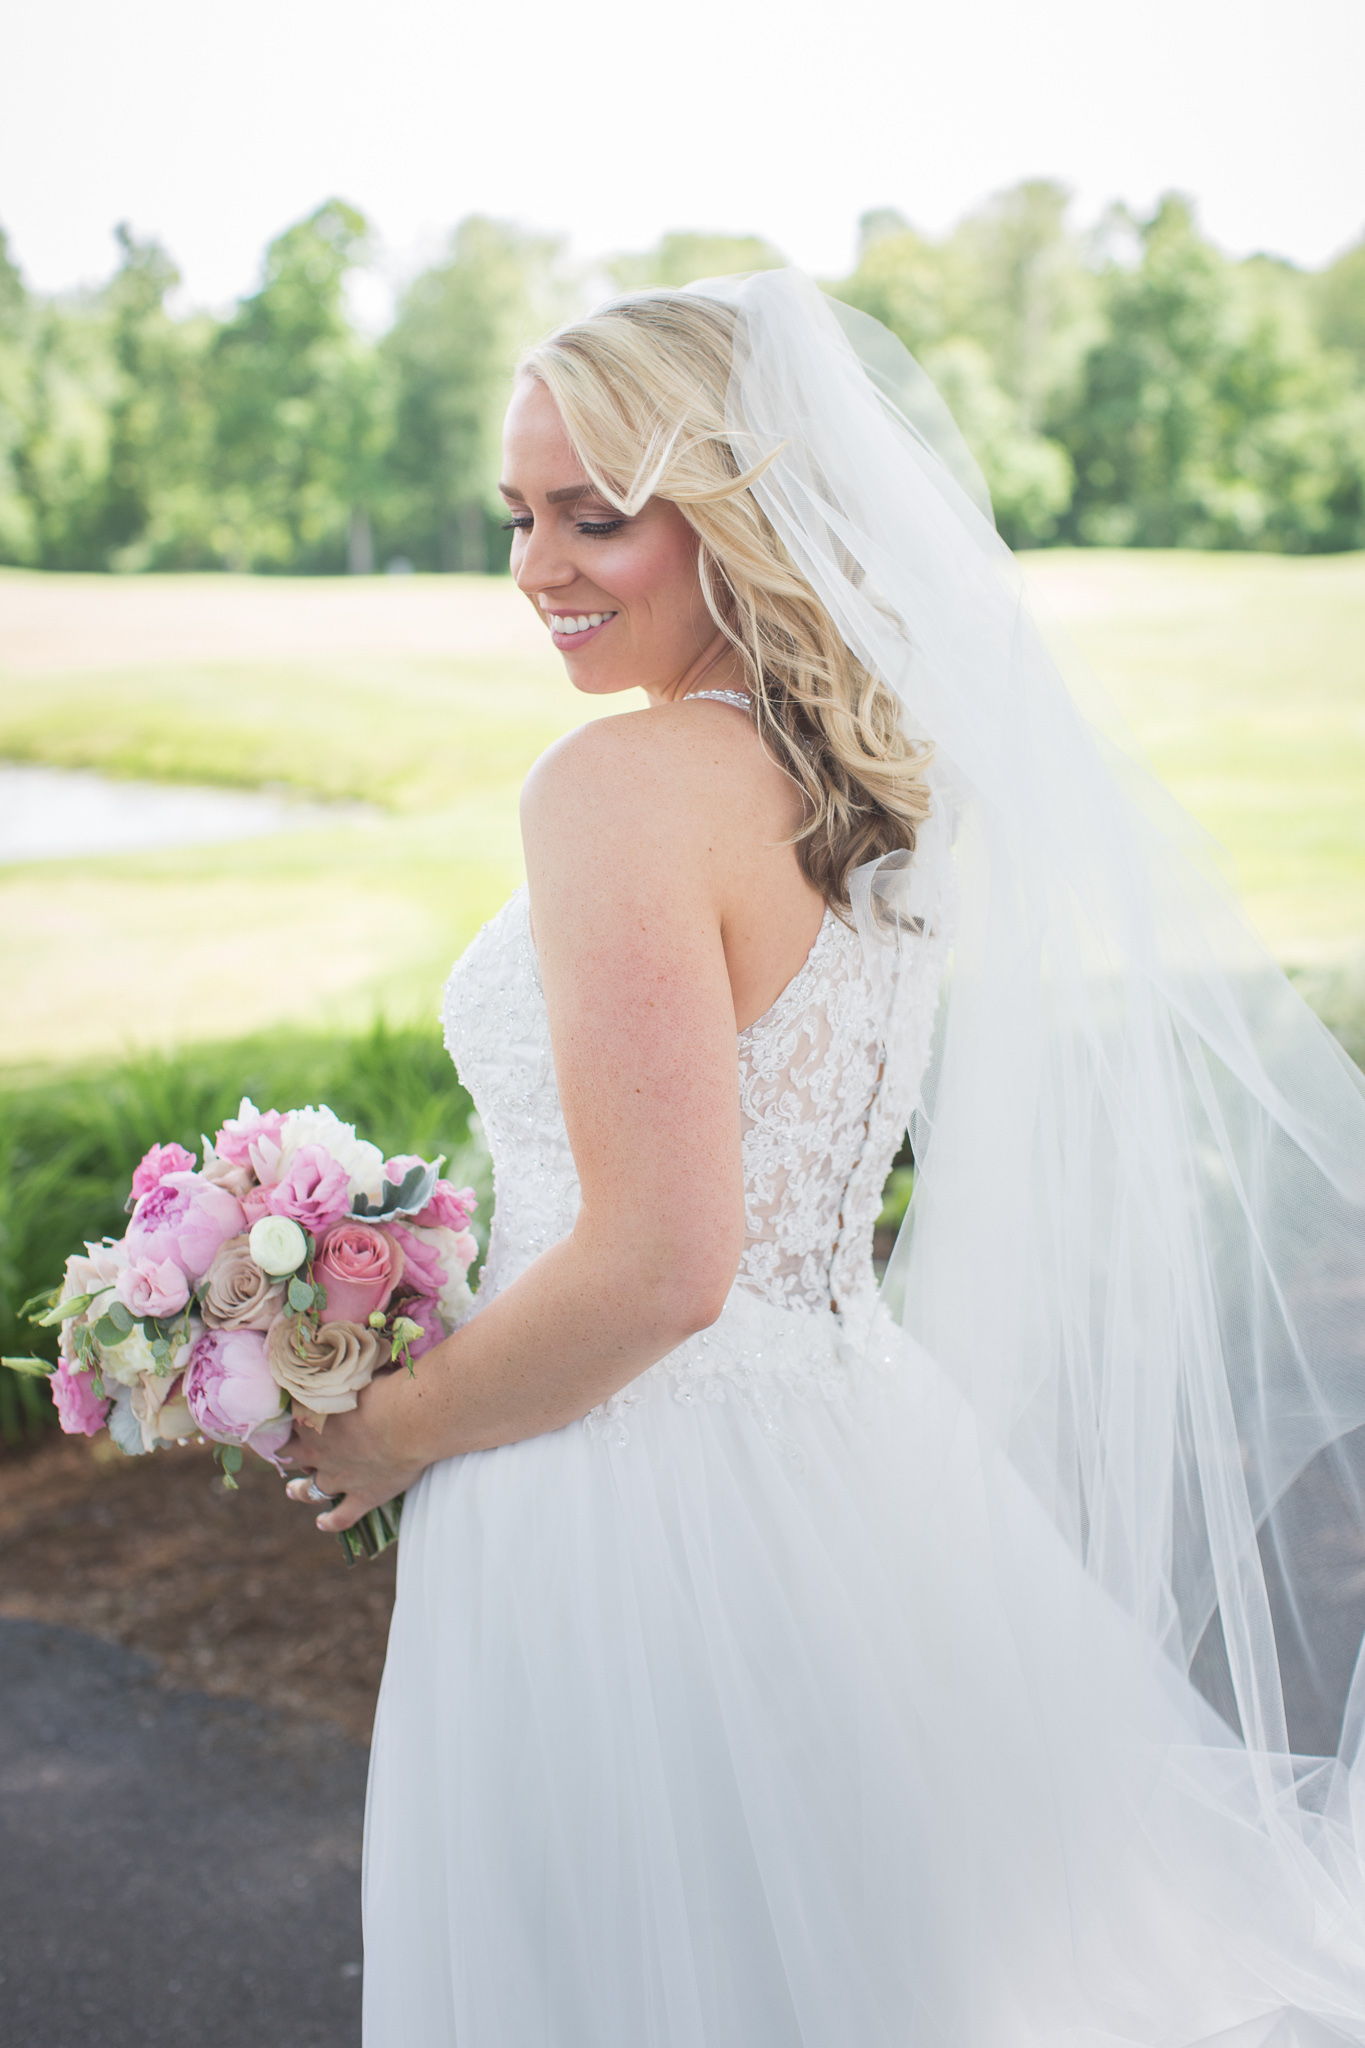 033-best-detroit-michigan-outdoor-wedding-photographer.jpg